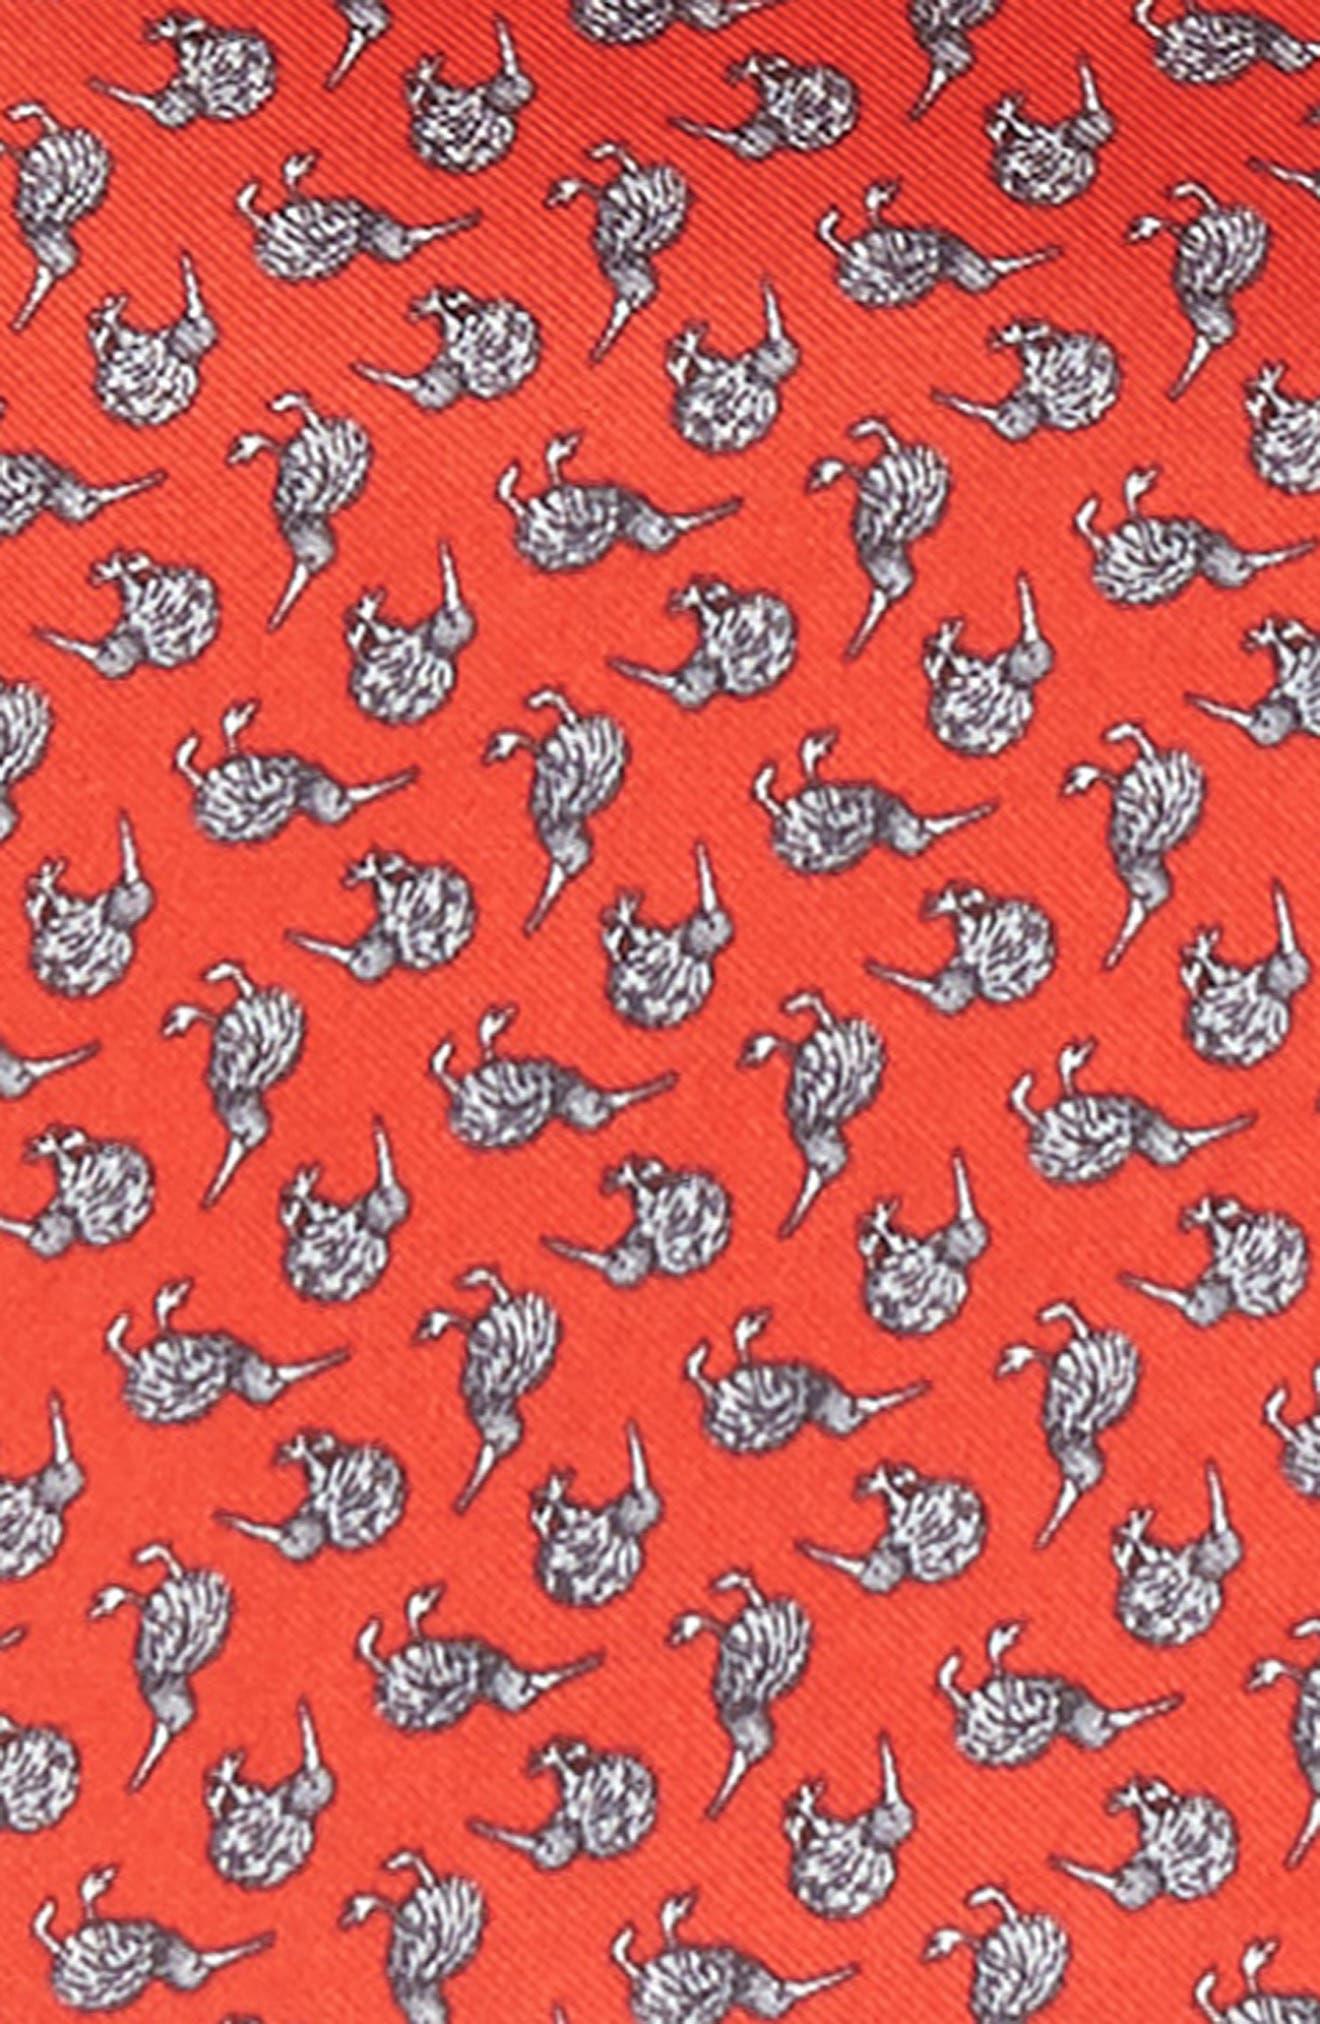 Cheeky Kiwi Silk Pocket Square,                             Alternate thumbnail 3, color,                             Red